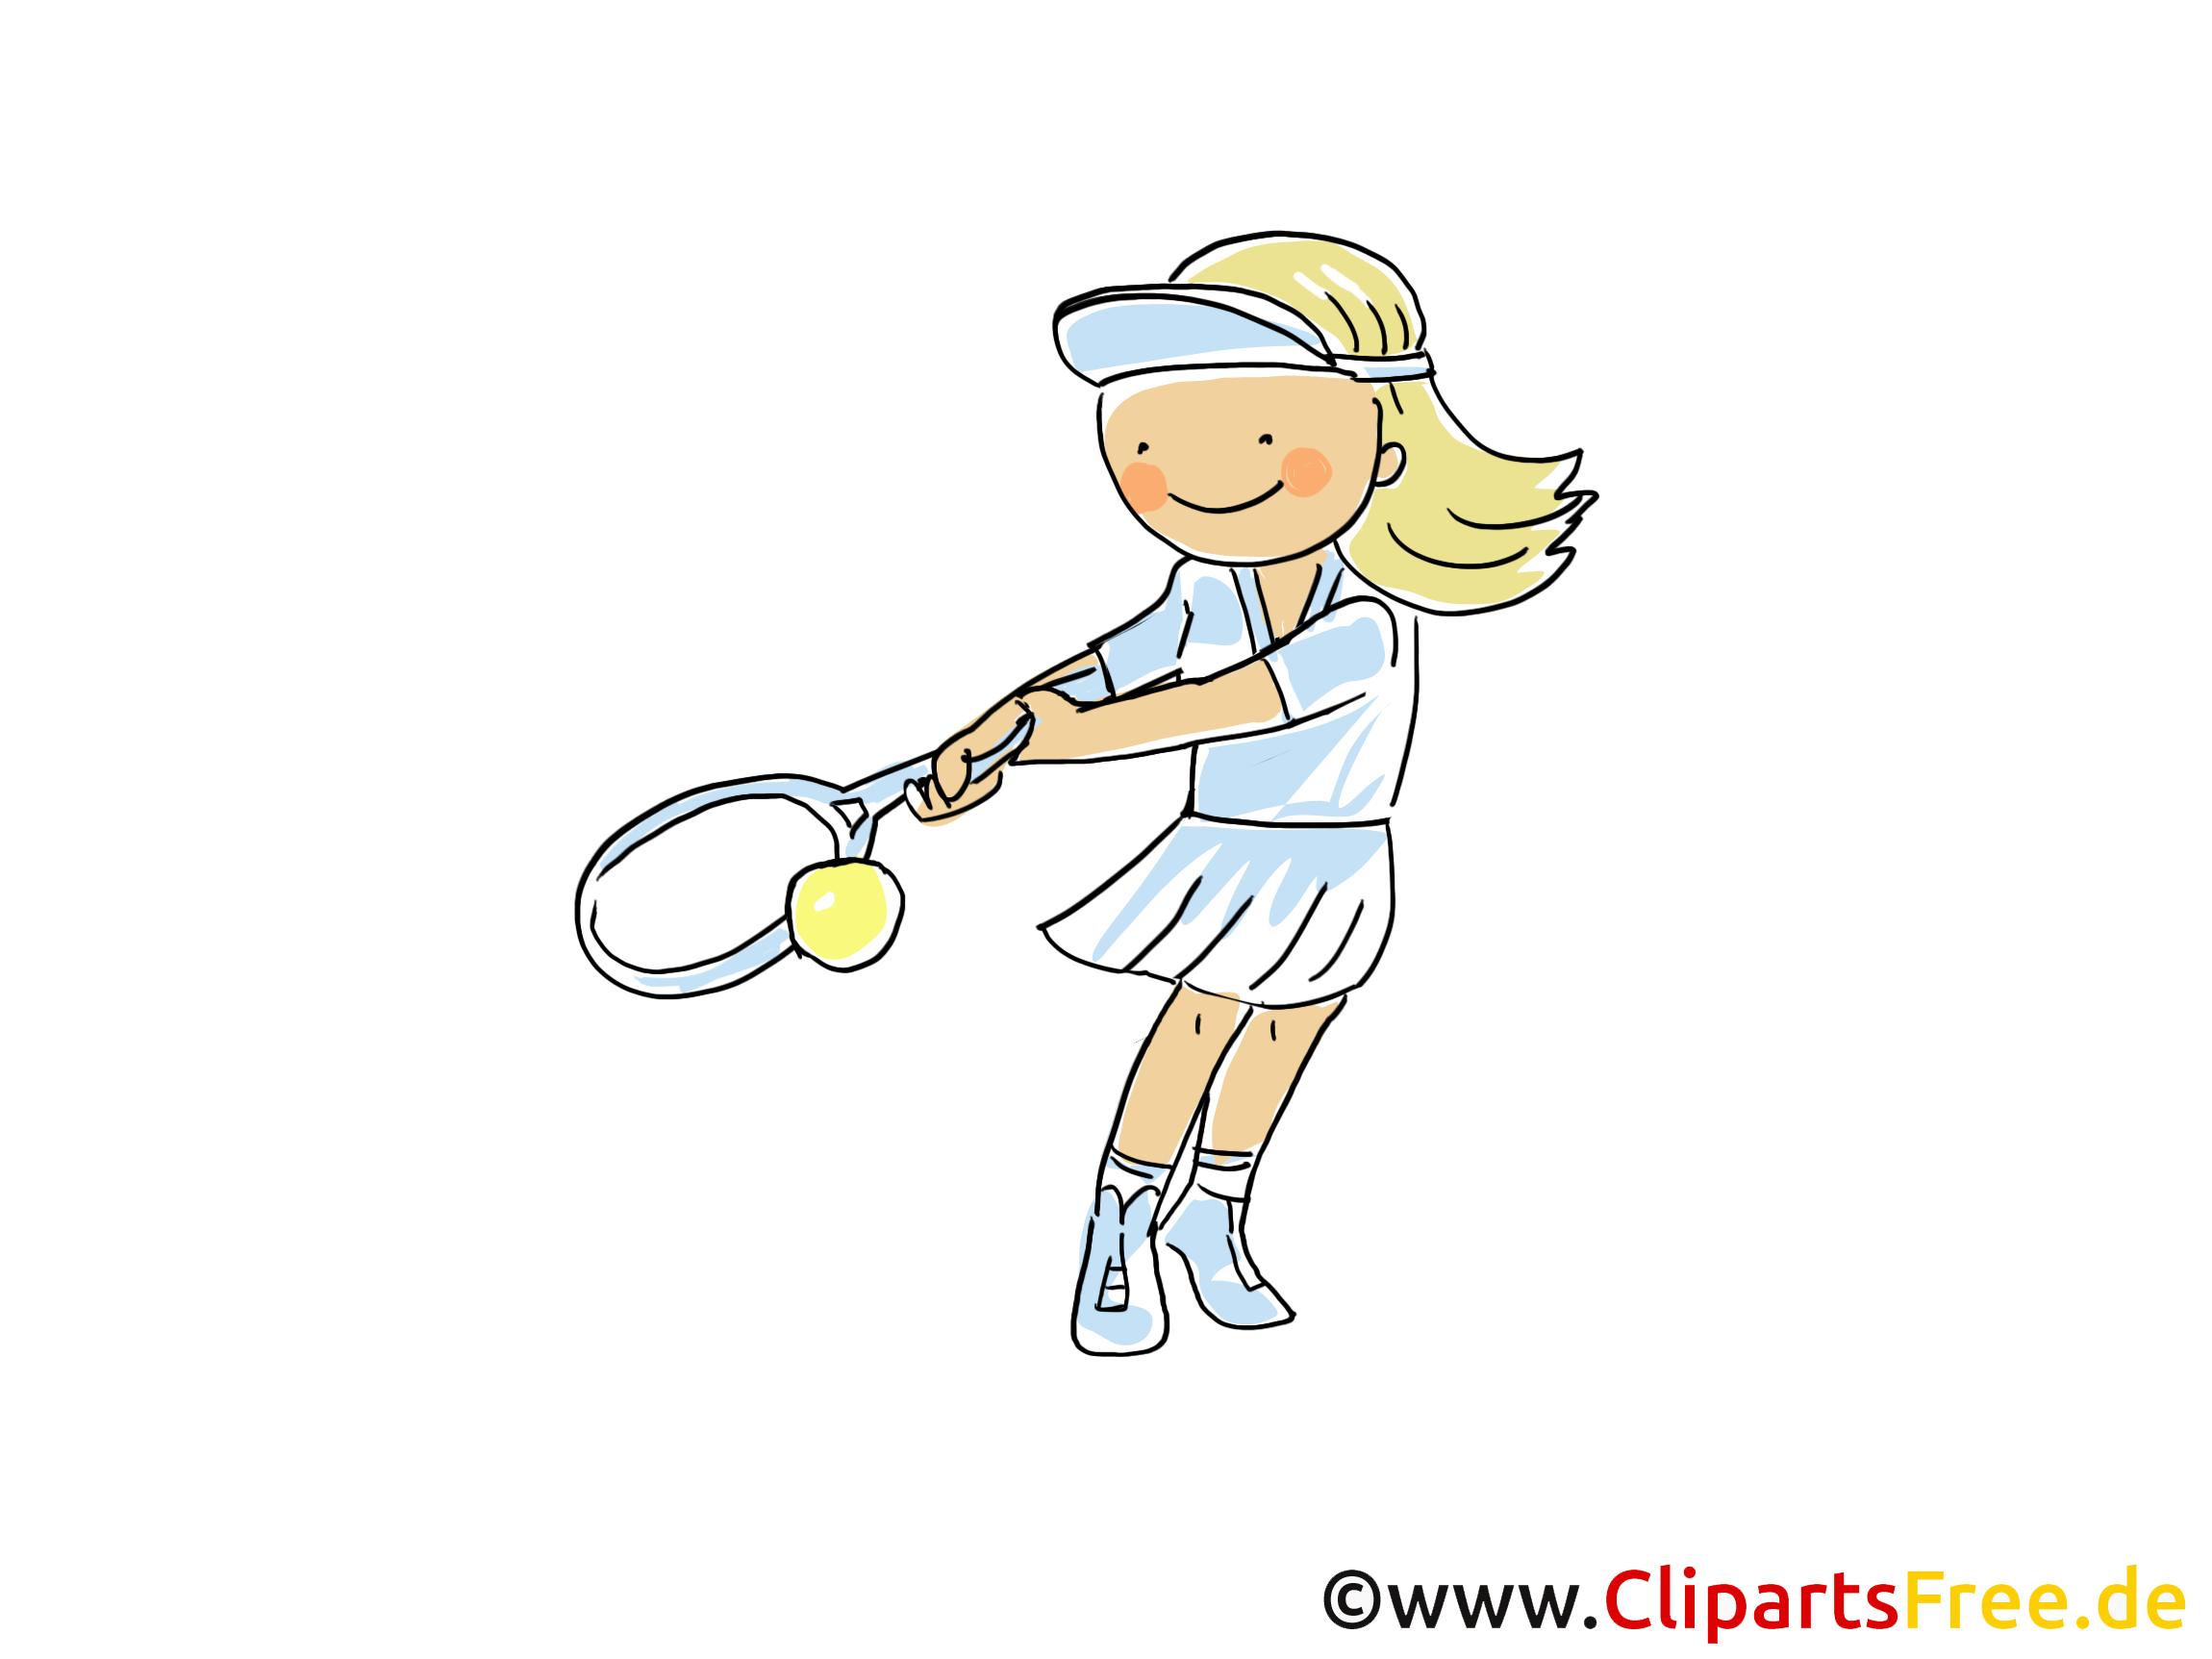 Tennis spielen Bild, Cliparts Sport, Comic, Cartoon, Image gratis.